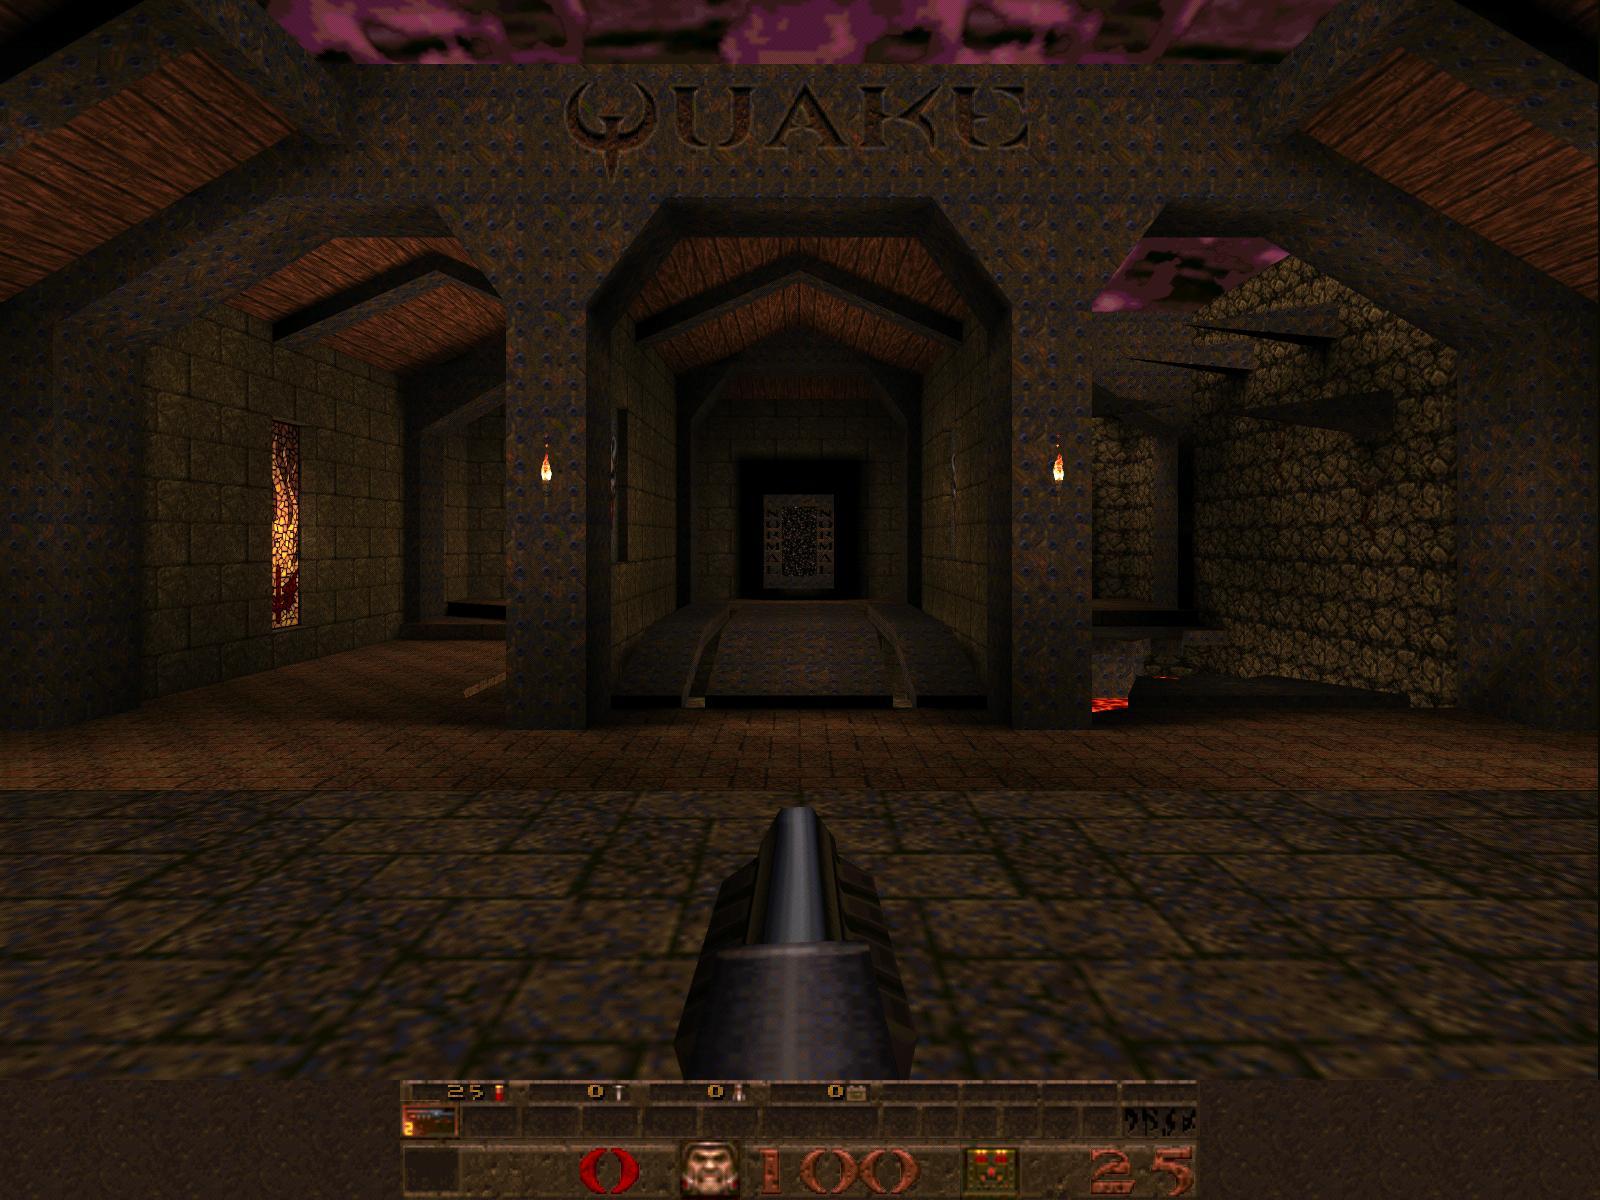 Quake-Screenshot.jpg